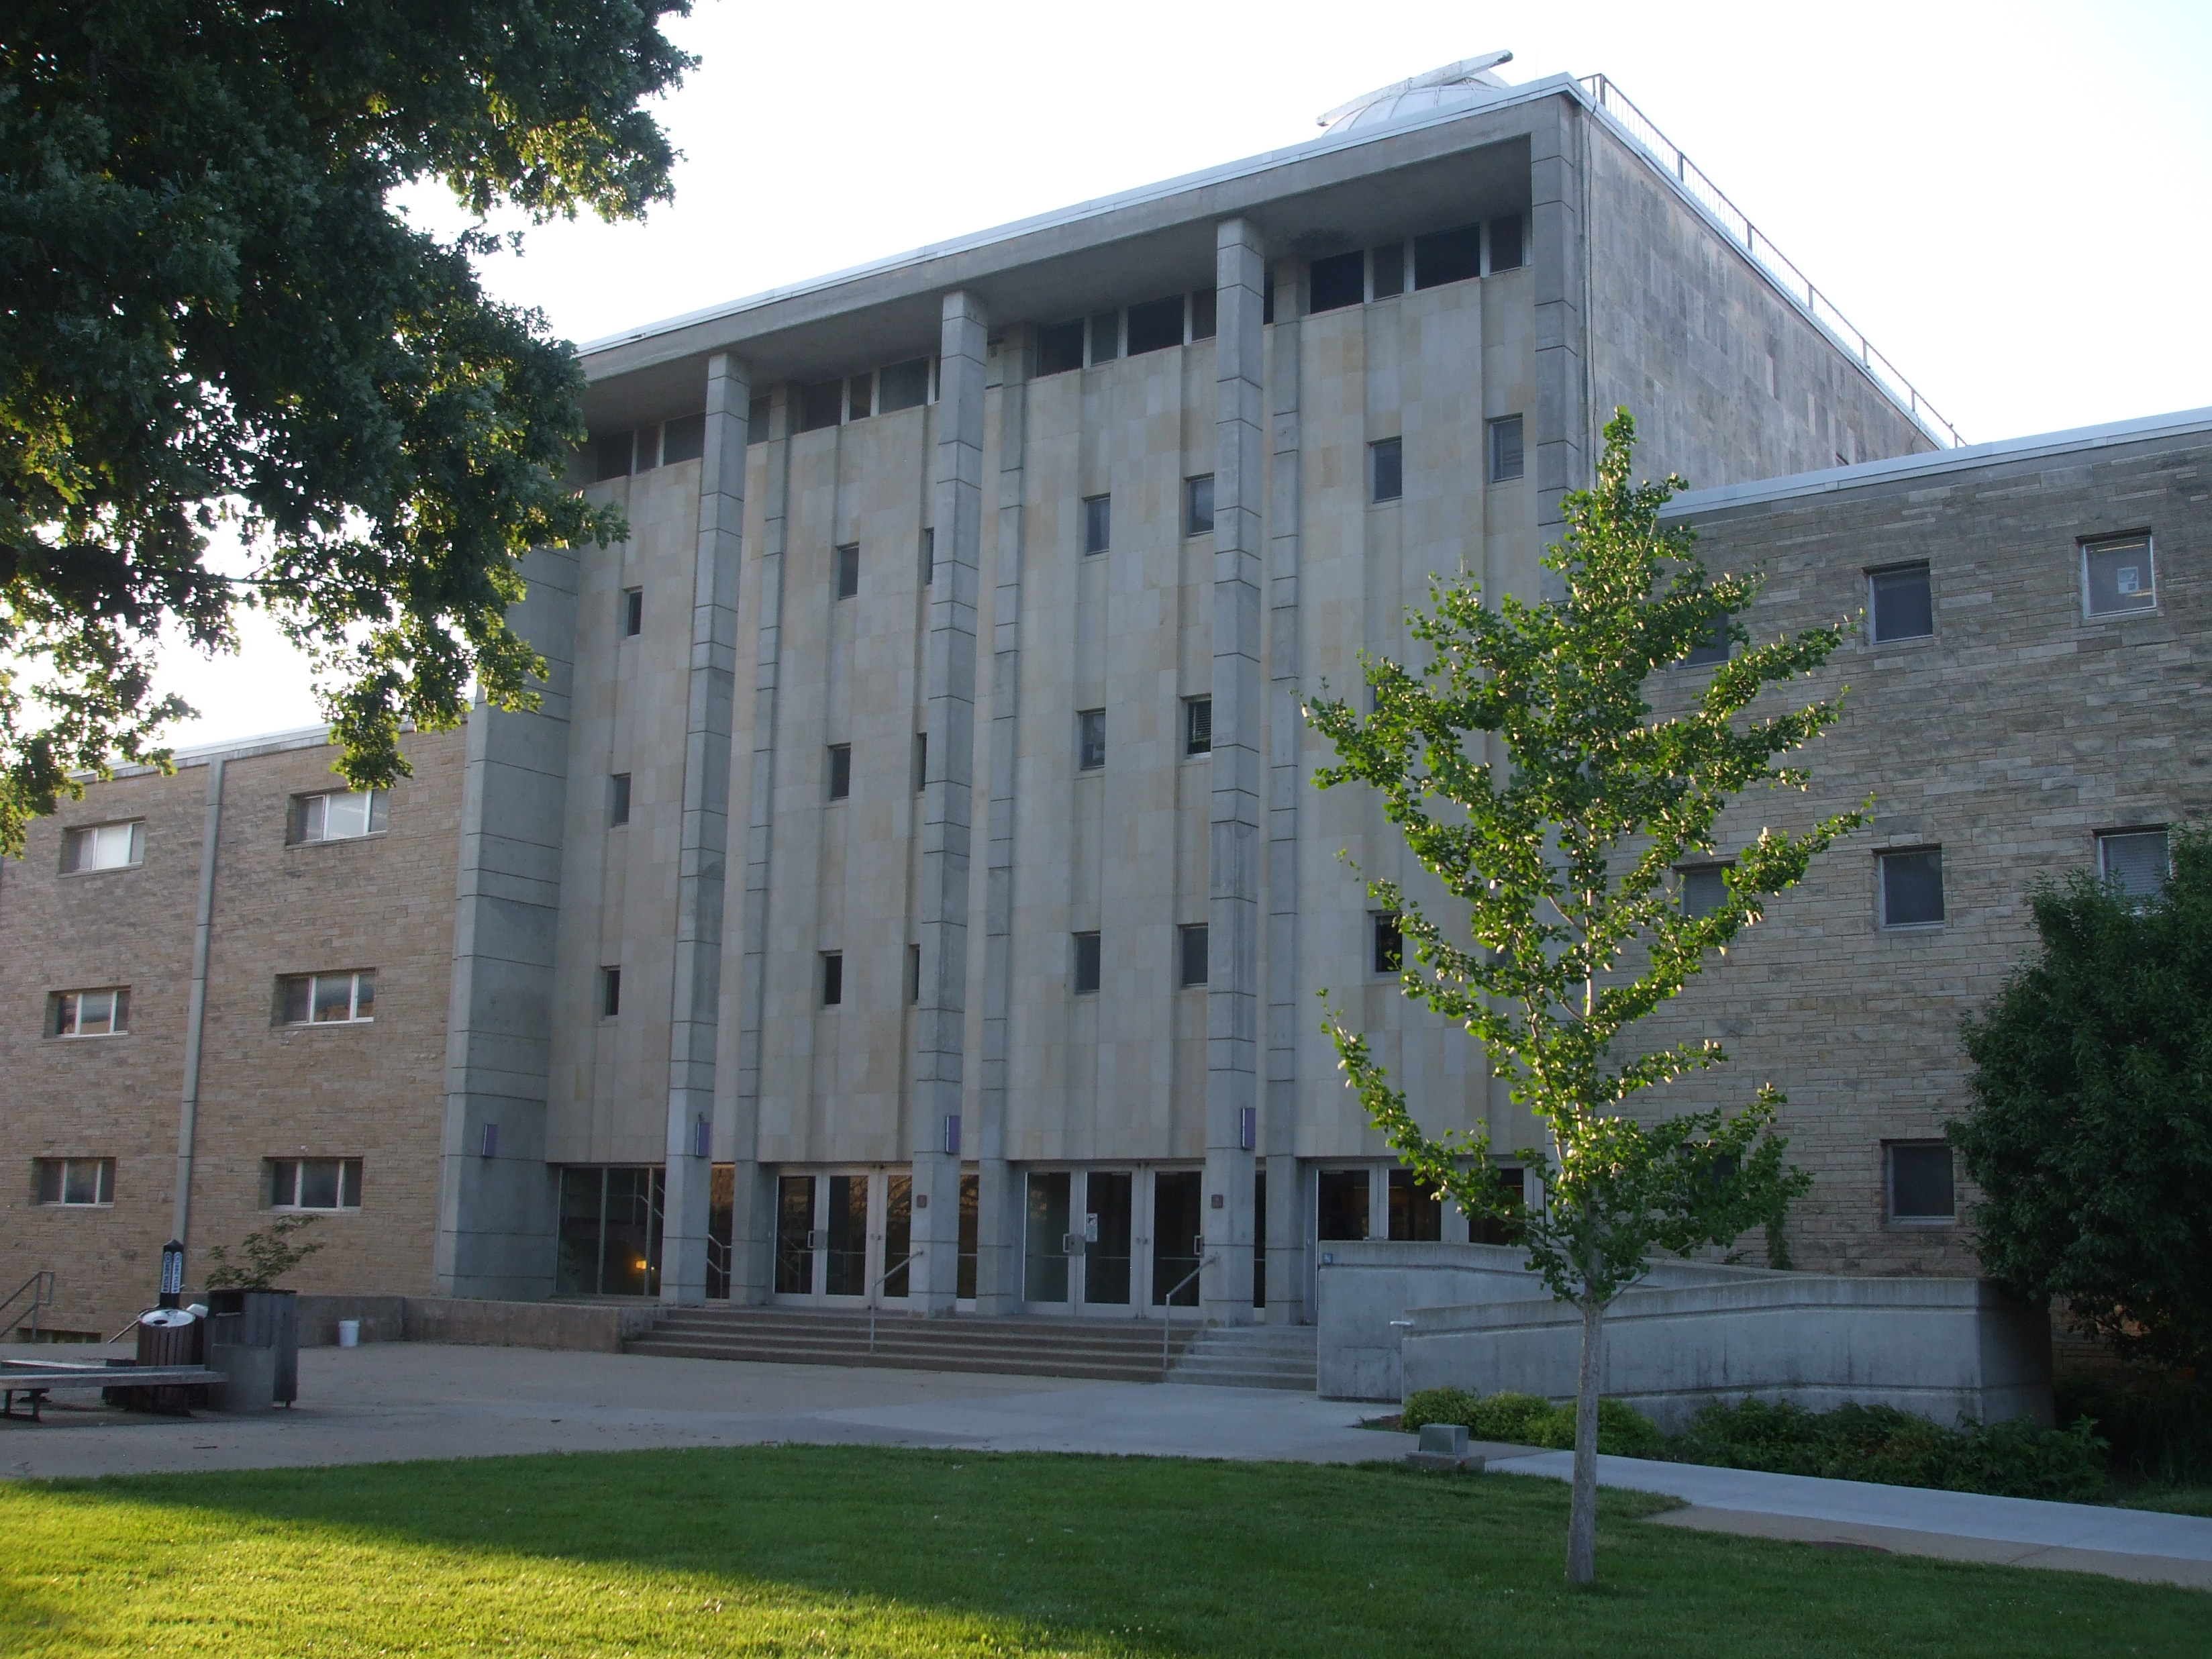 Description kansas state university cardwell hall